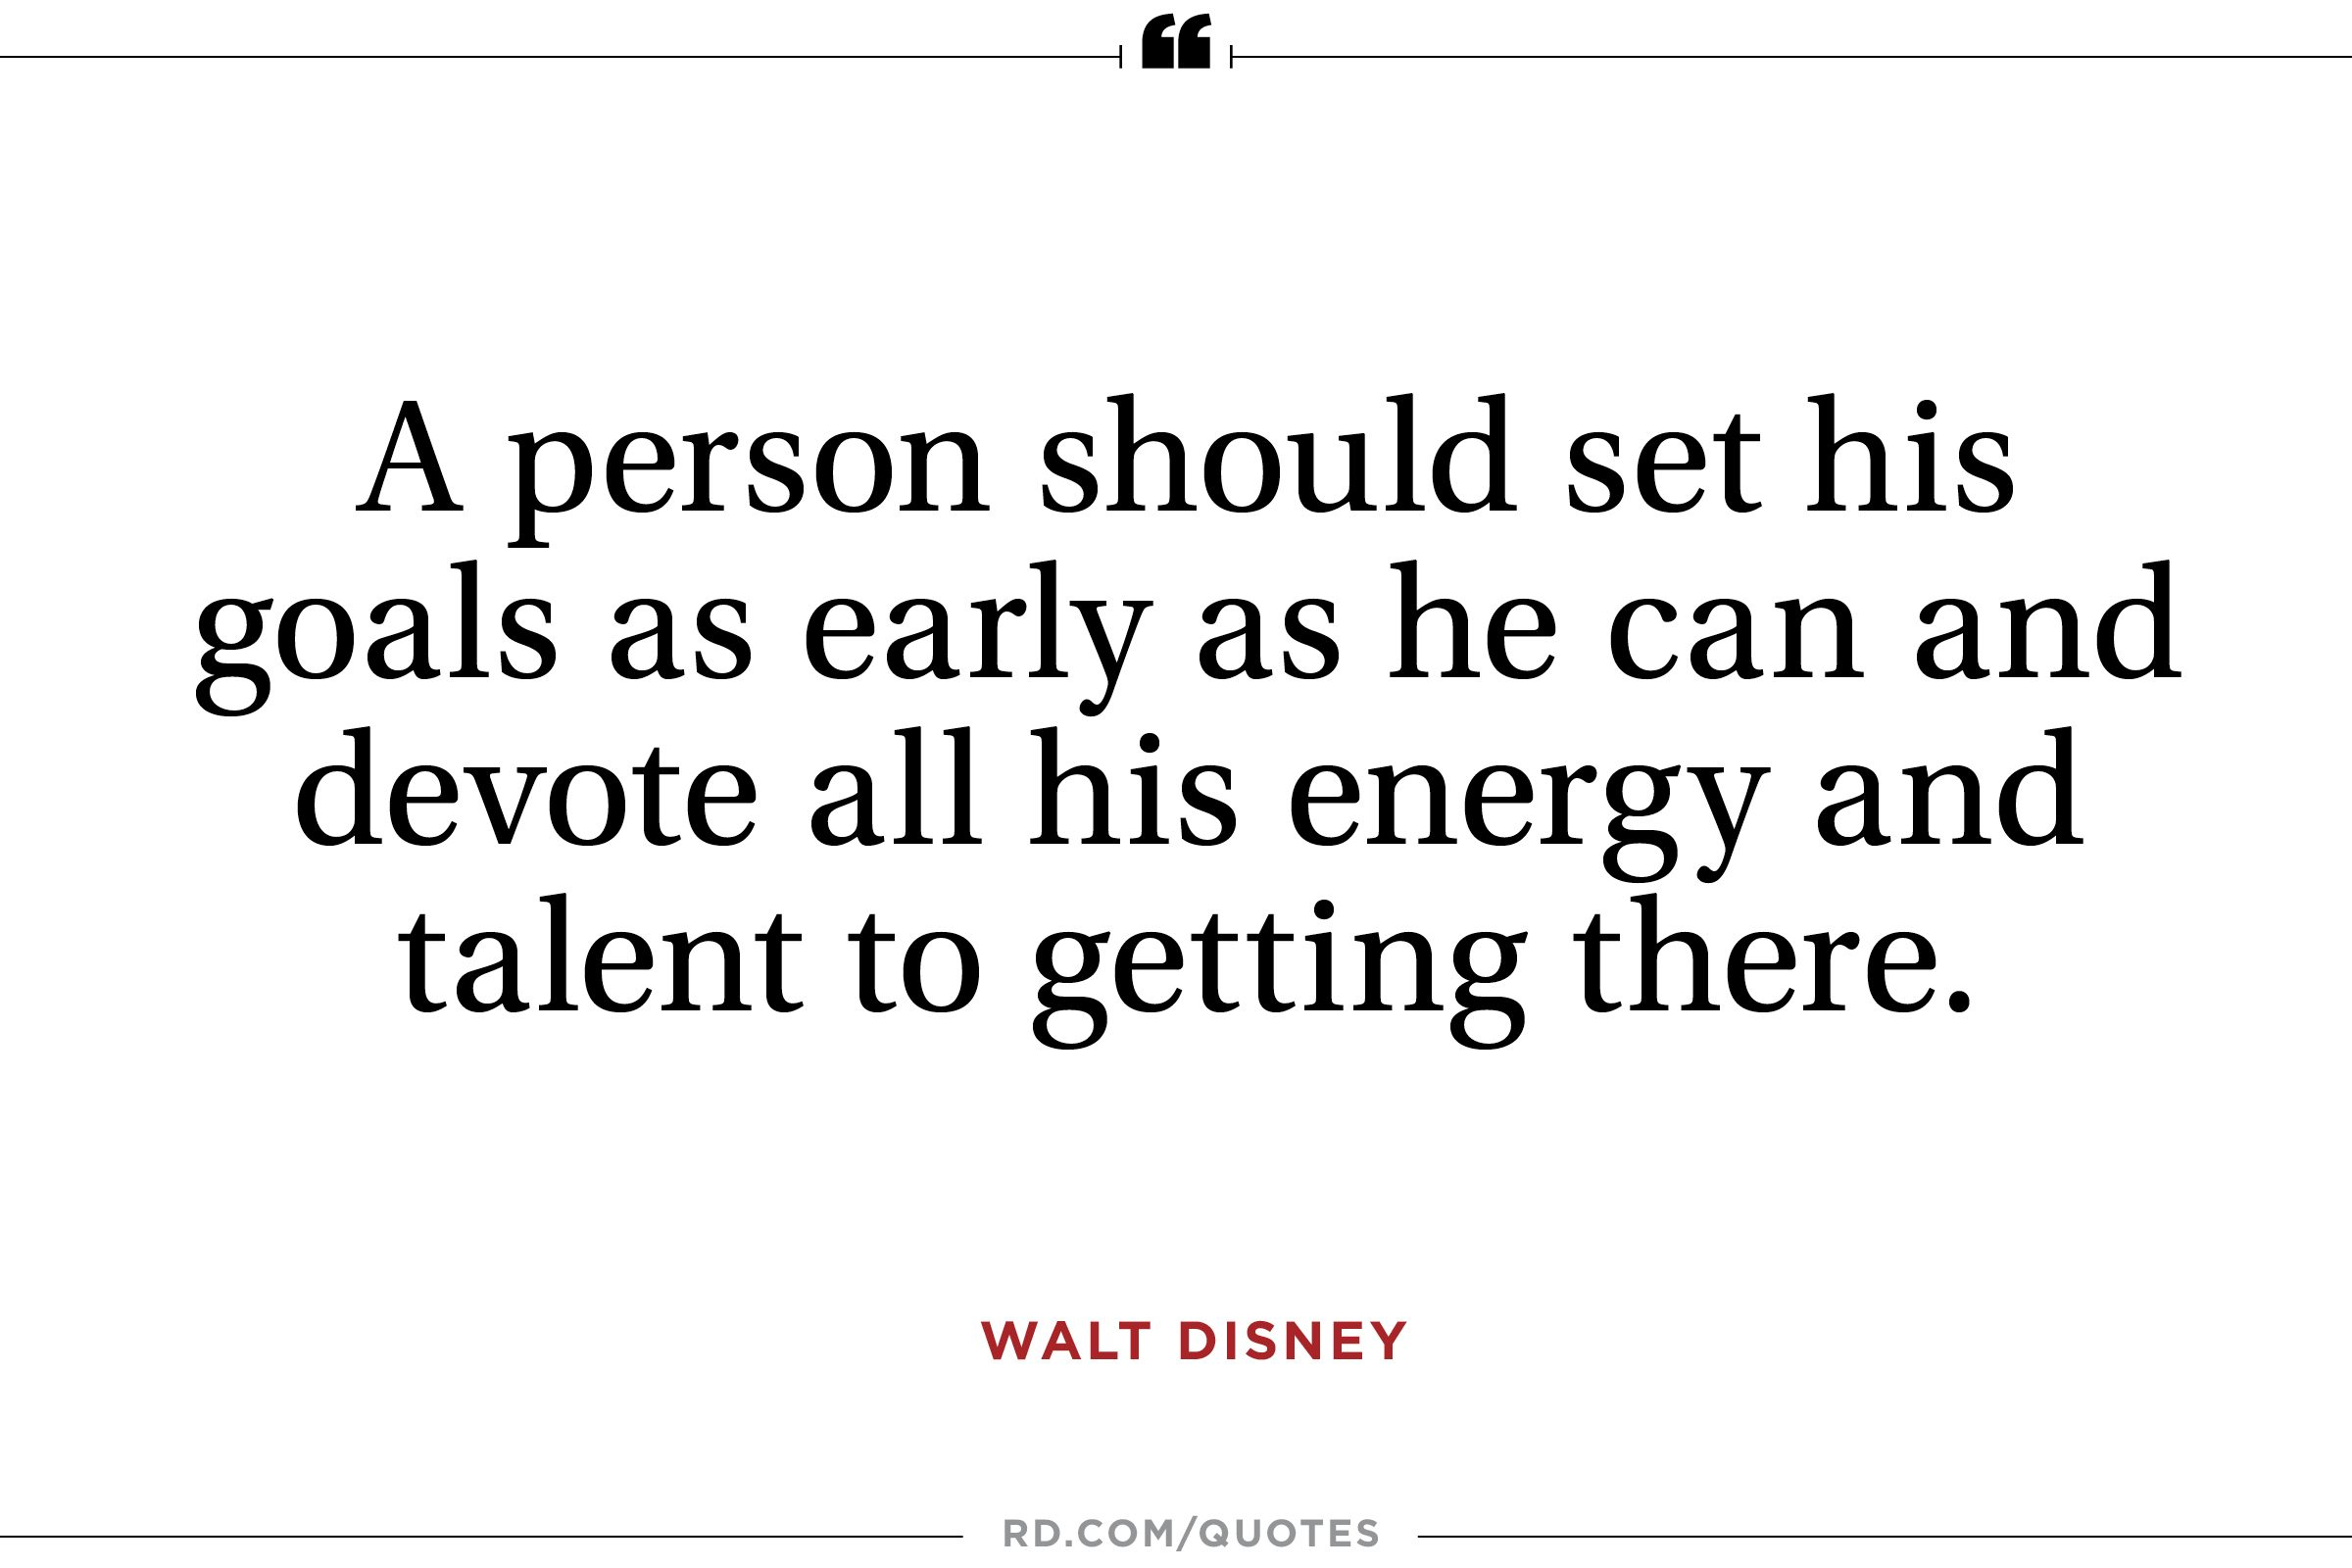 11 Inspiring Walt Disney Quotes | Reader\'s Digest